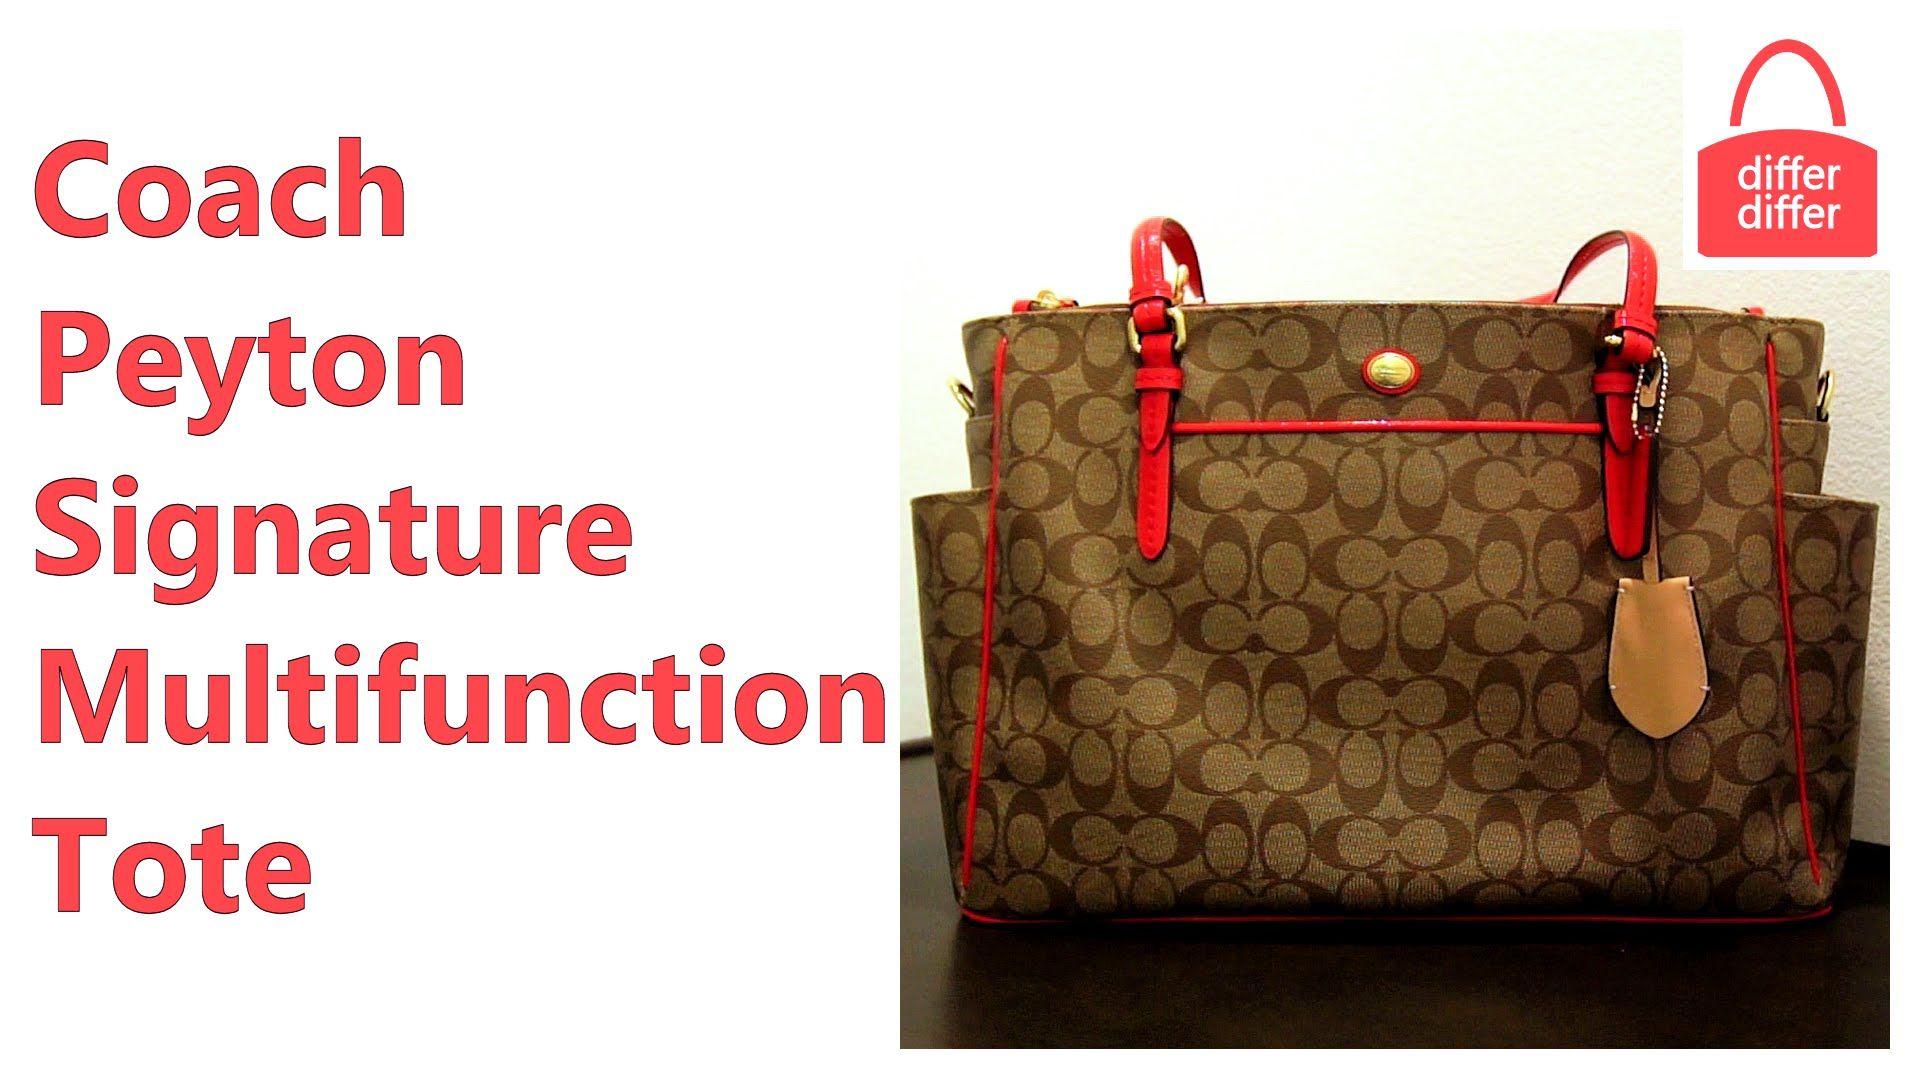 Coach Peyton Signature Multifunction Tote handbag videos